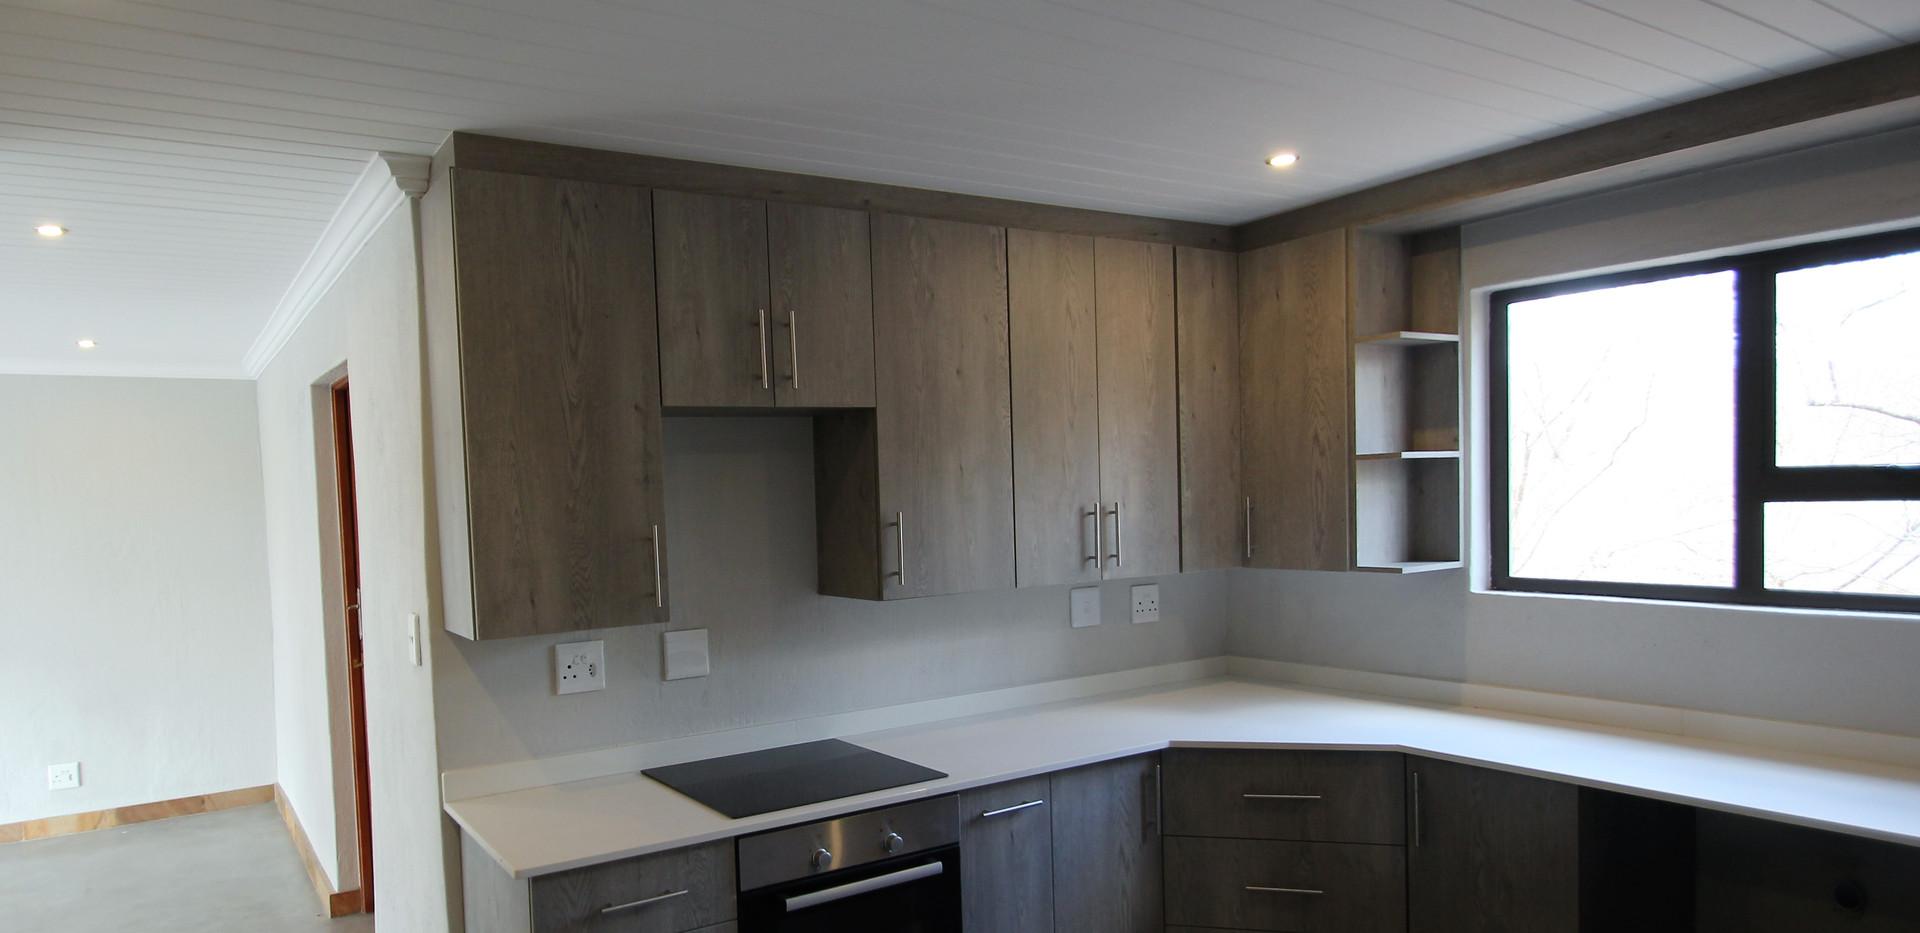 house-for-sale-in-hoedspruit-5.jpg